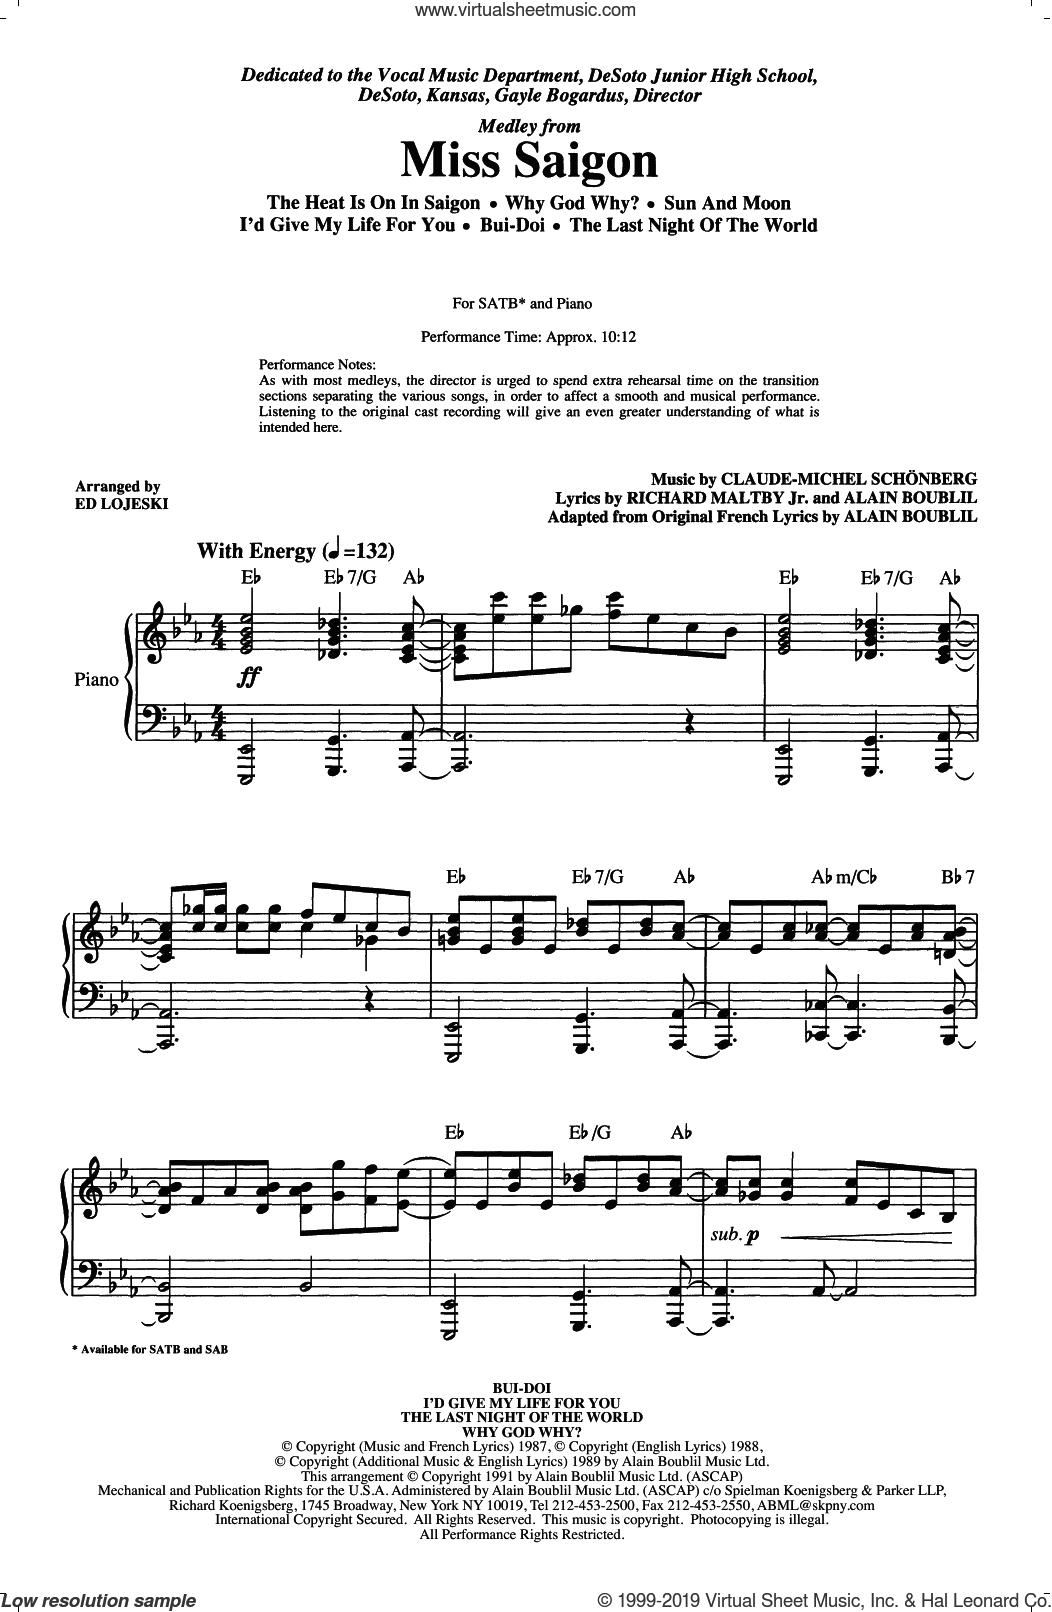 Miss Saigon (Medley) (arr. Ed Lojeski) sheet music for choir (SATB: soprano, alto, tenor, bass) by Alain Boublil, Ed Lojeski, Claude-Michel Schonberg and Richard Maltby, Jr., intermediate skill level